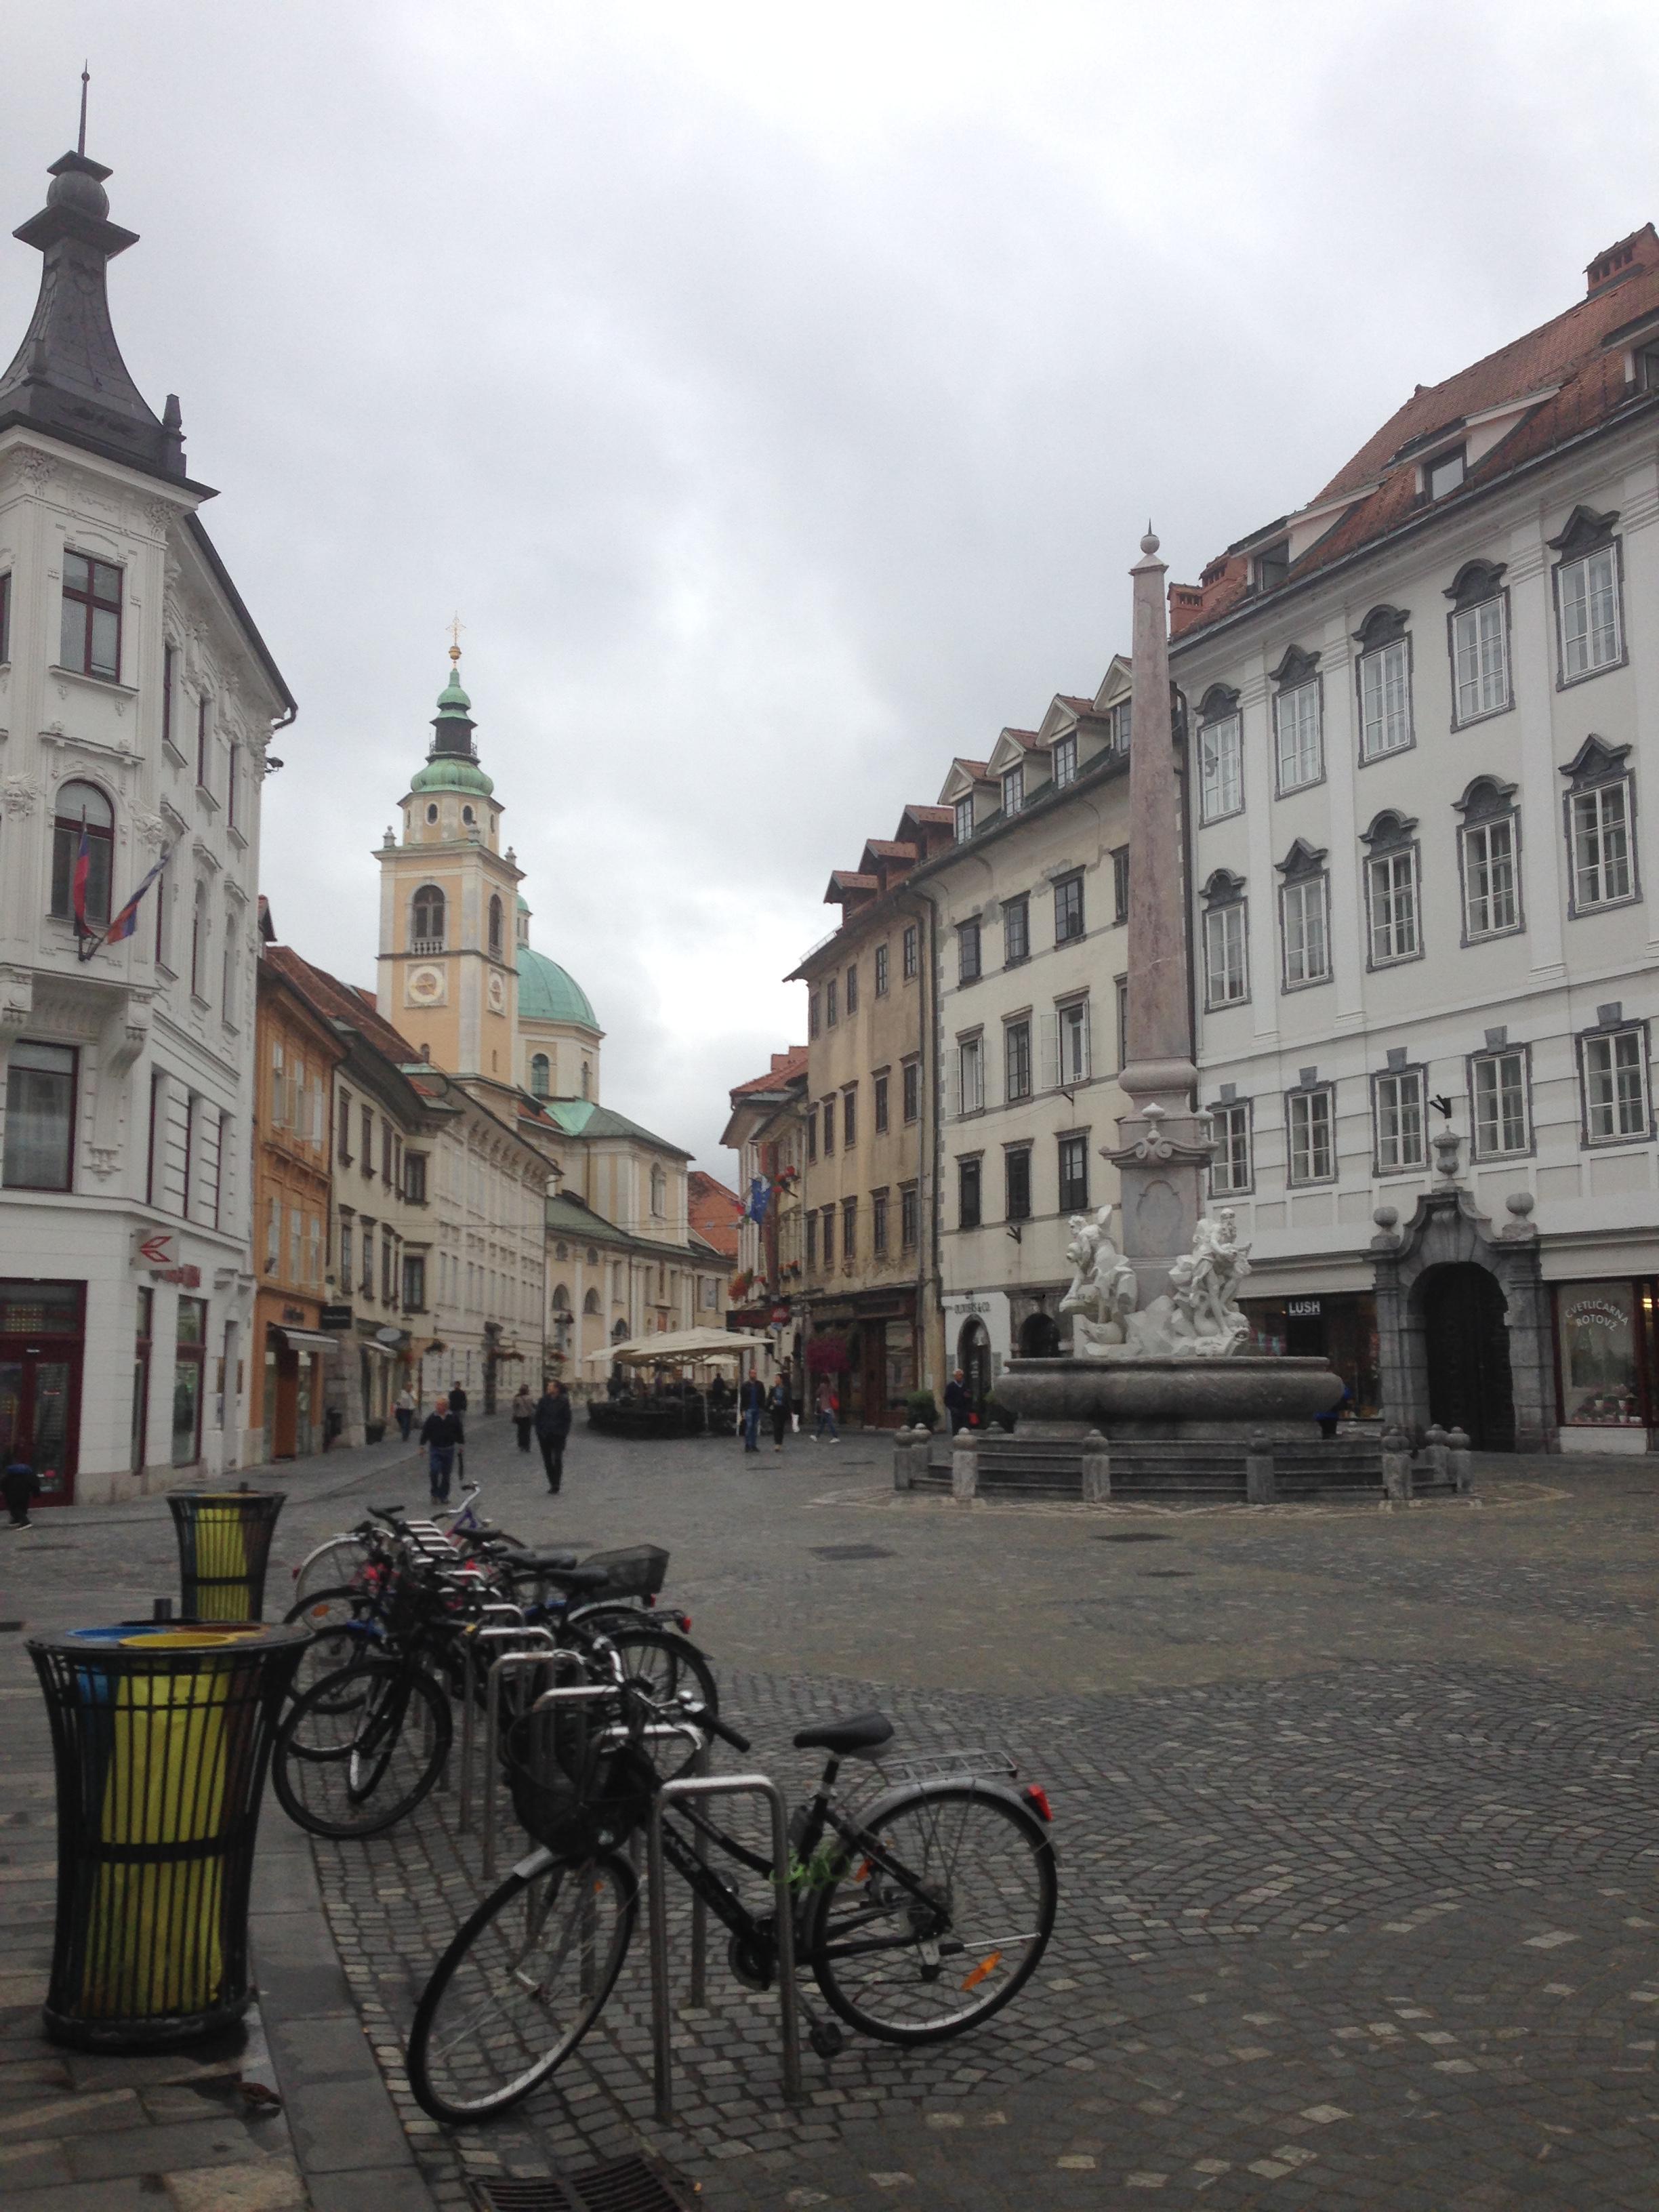 Jetzt geht's los! – Mein Auslandssemester in Slowenien